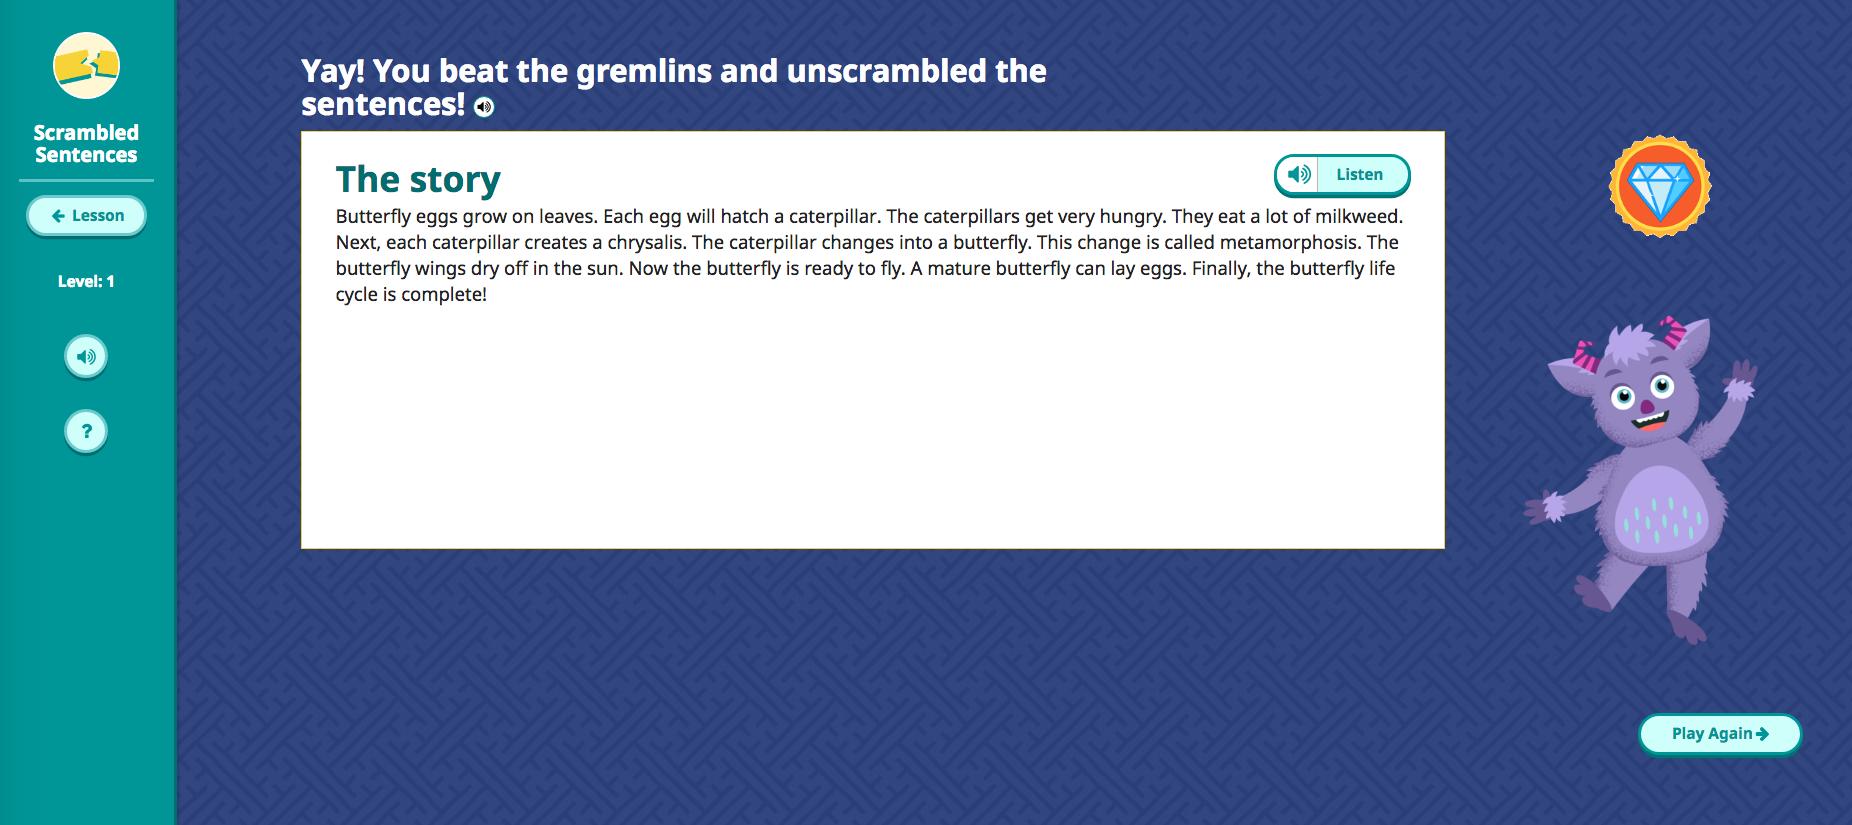 Scrambled_Sentences_Placeholder.png